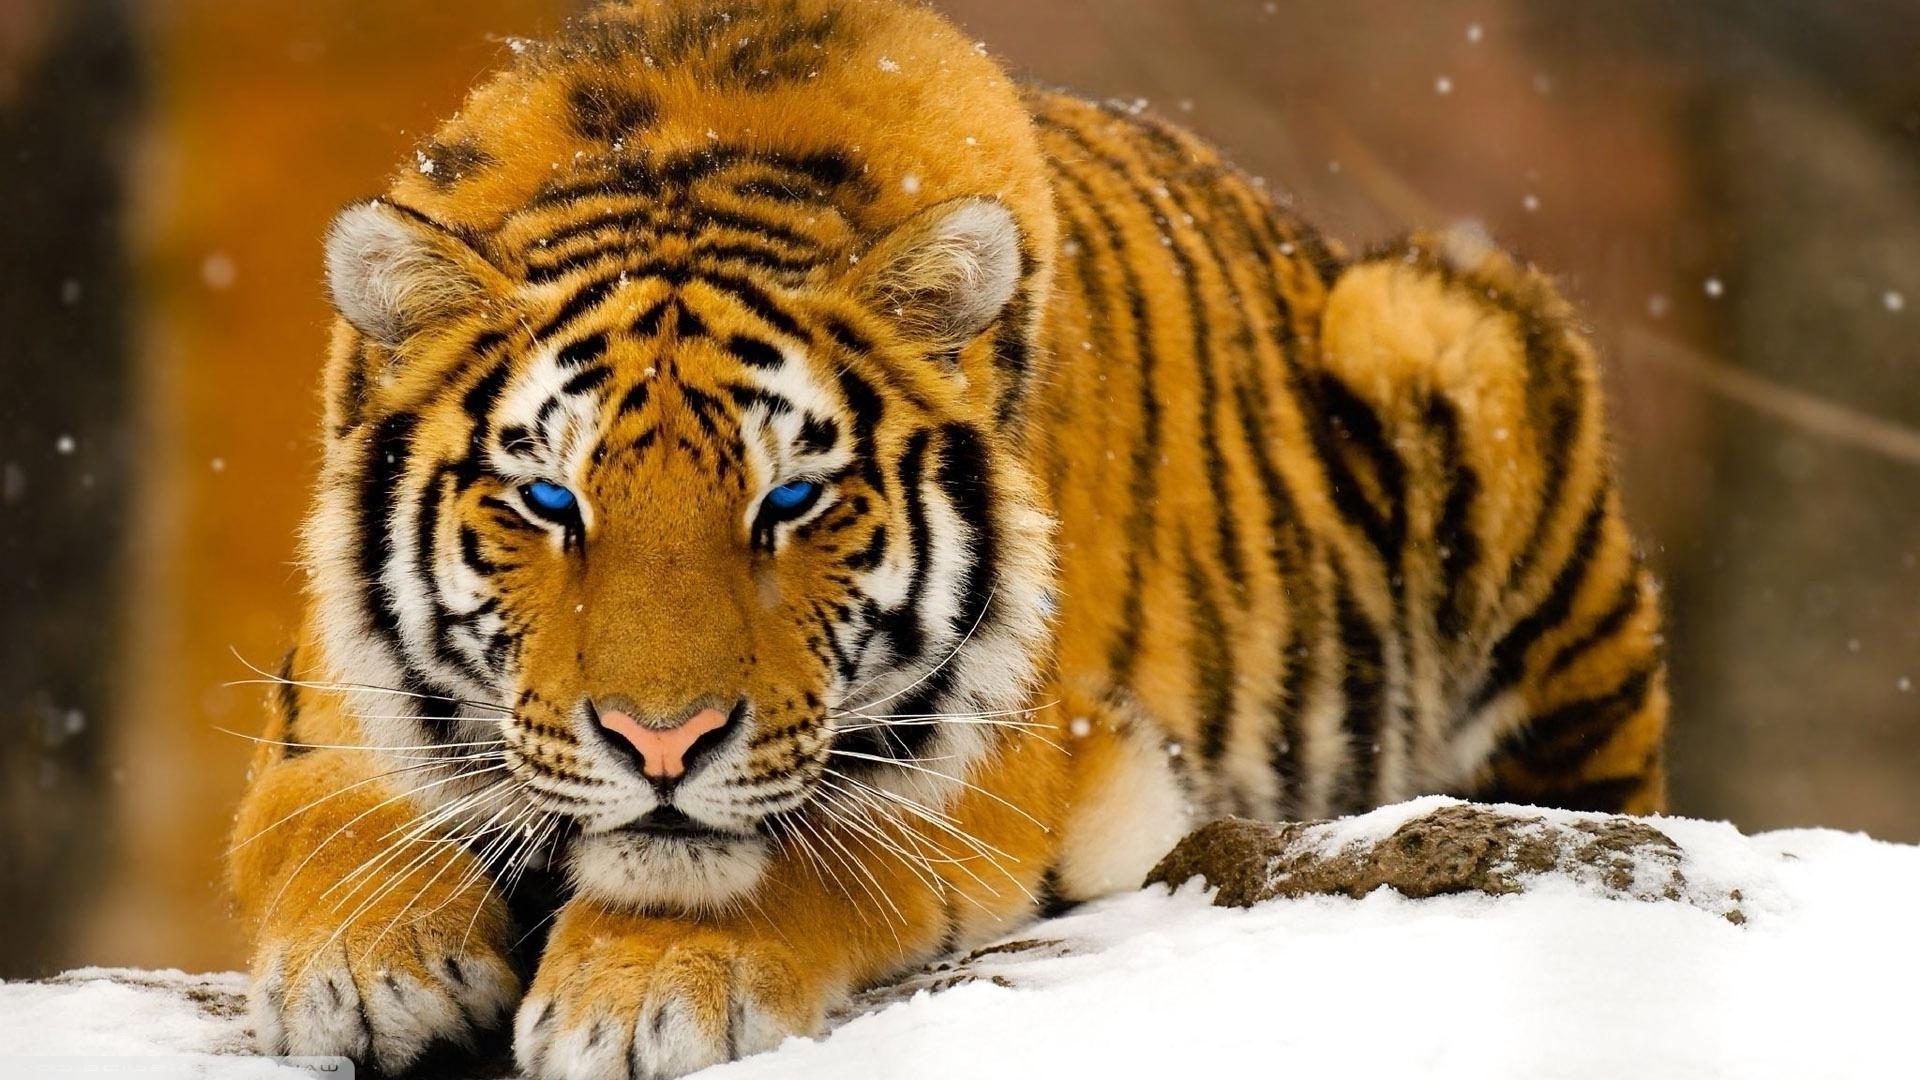 wallpaper : animals, tiger, wildlife, big cats, whiskers, 1920x1080